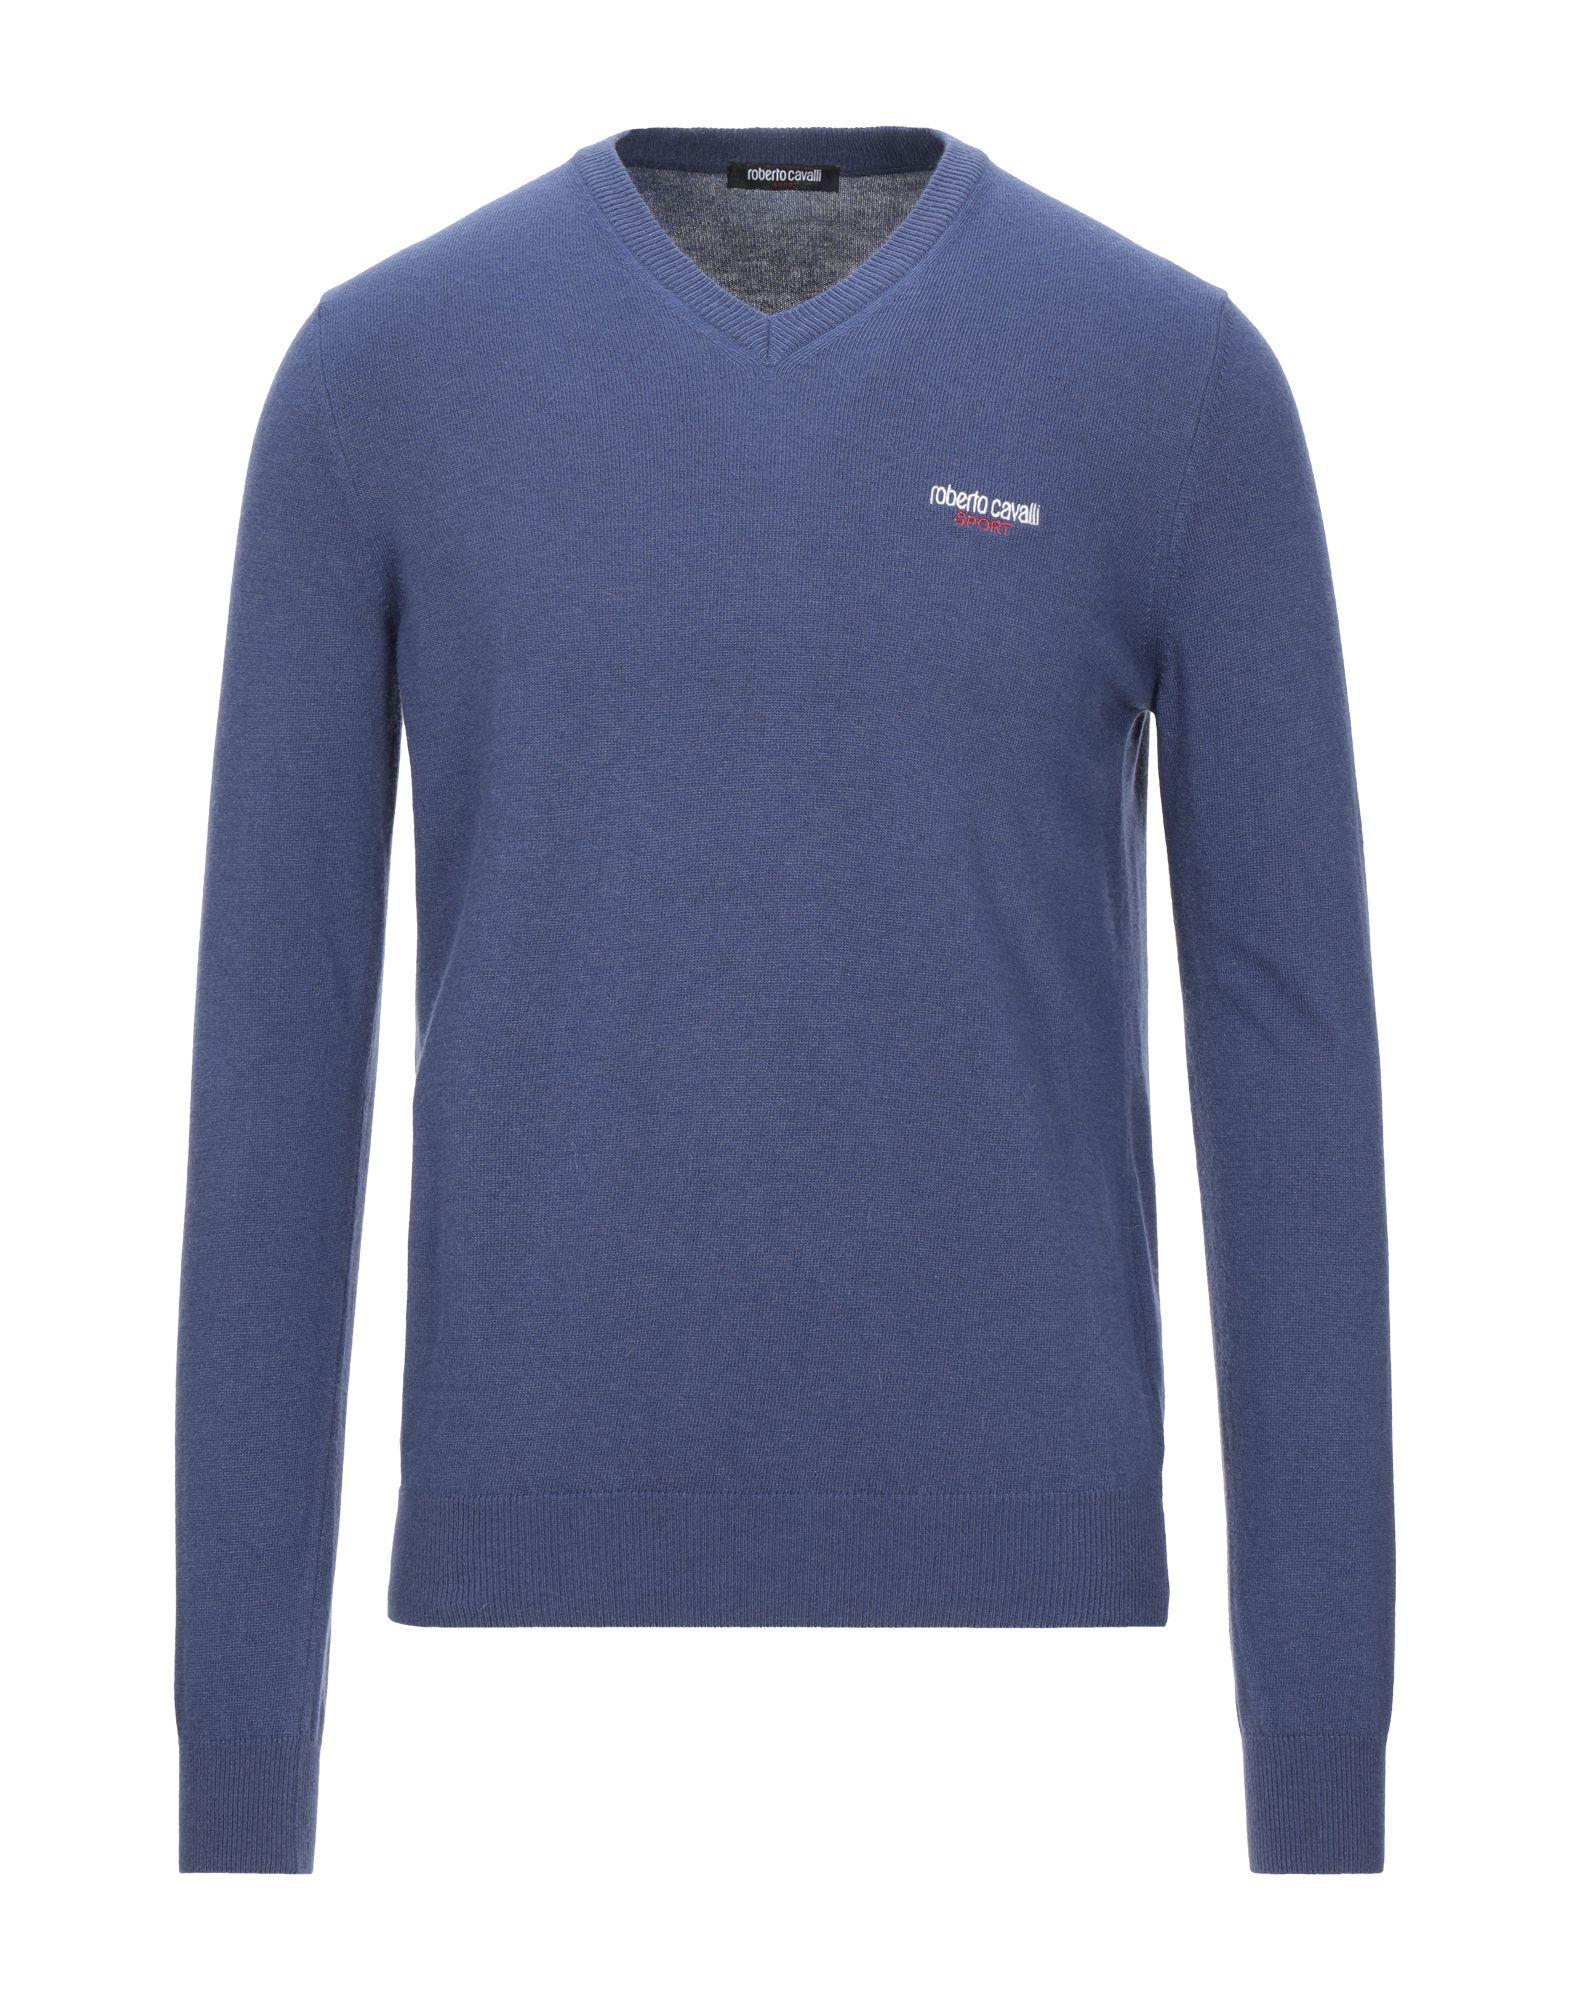 Roberto Cavalli Sport Dark Blue Jumper